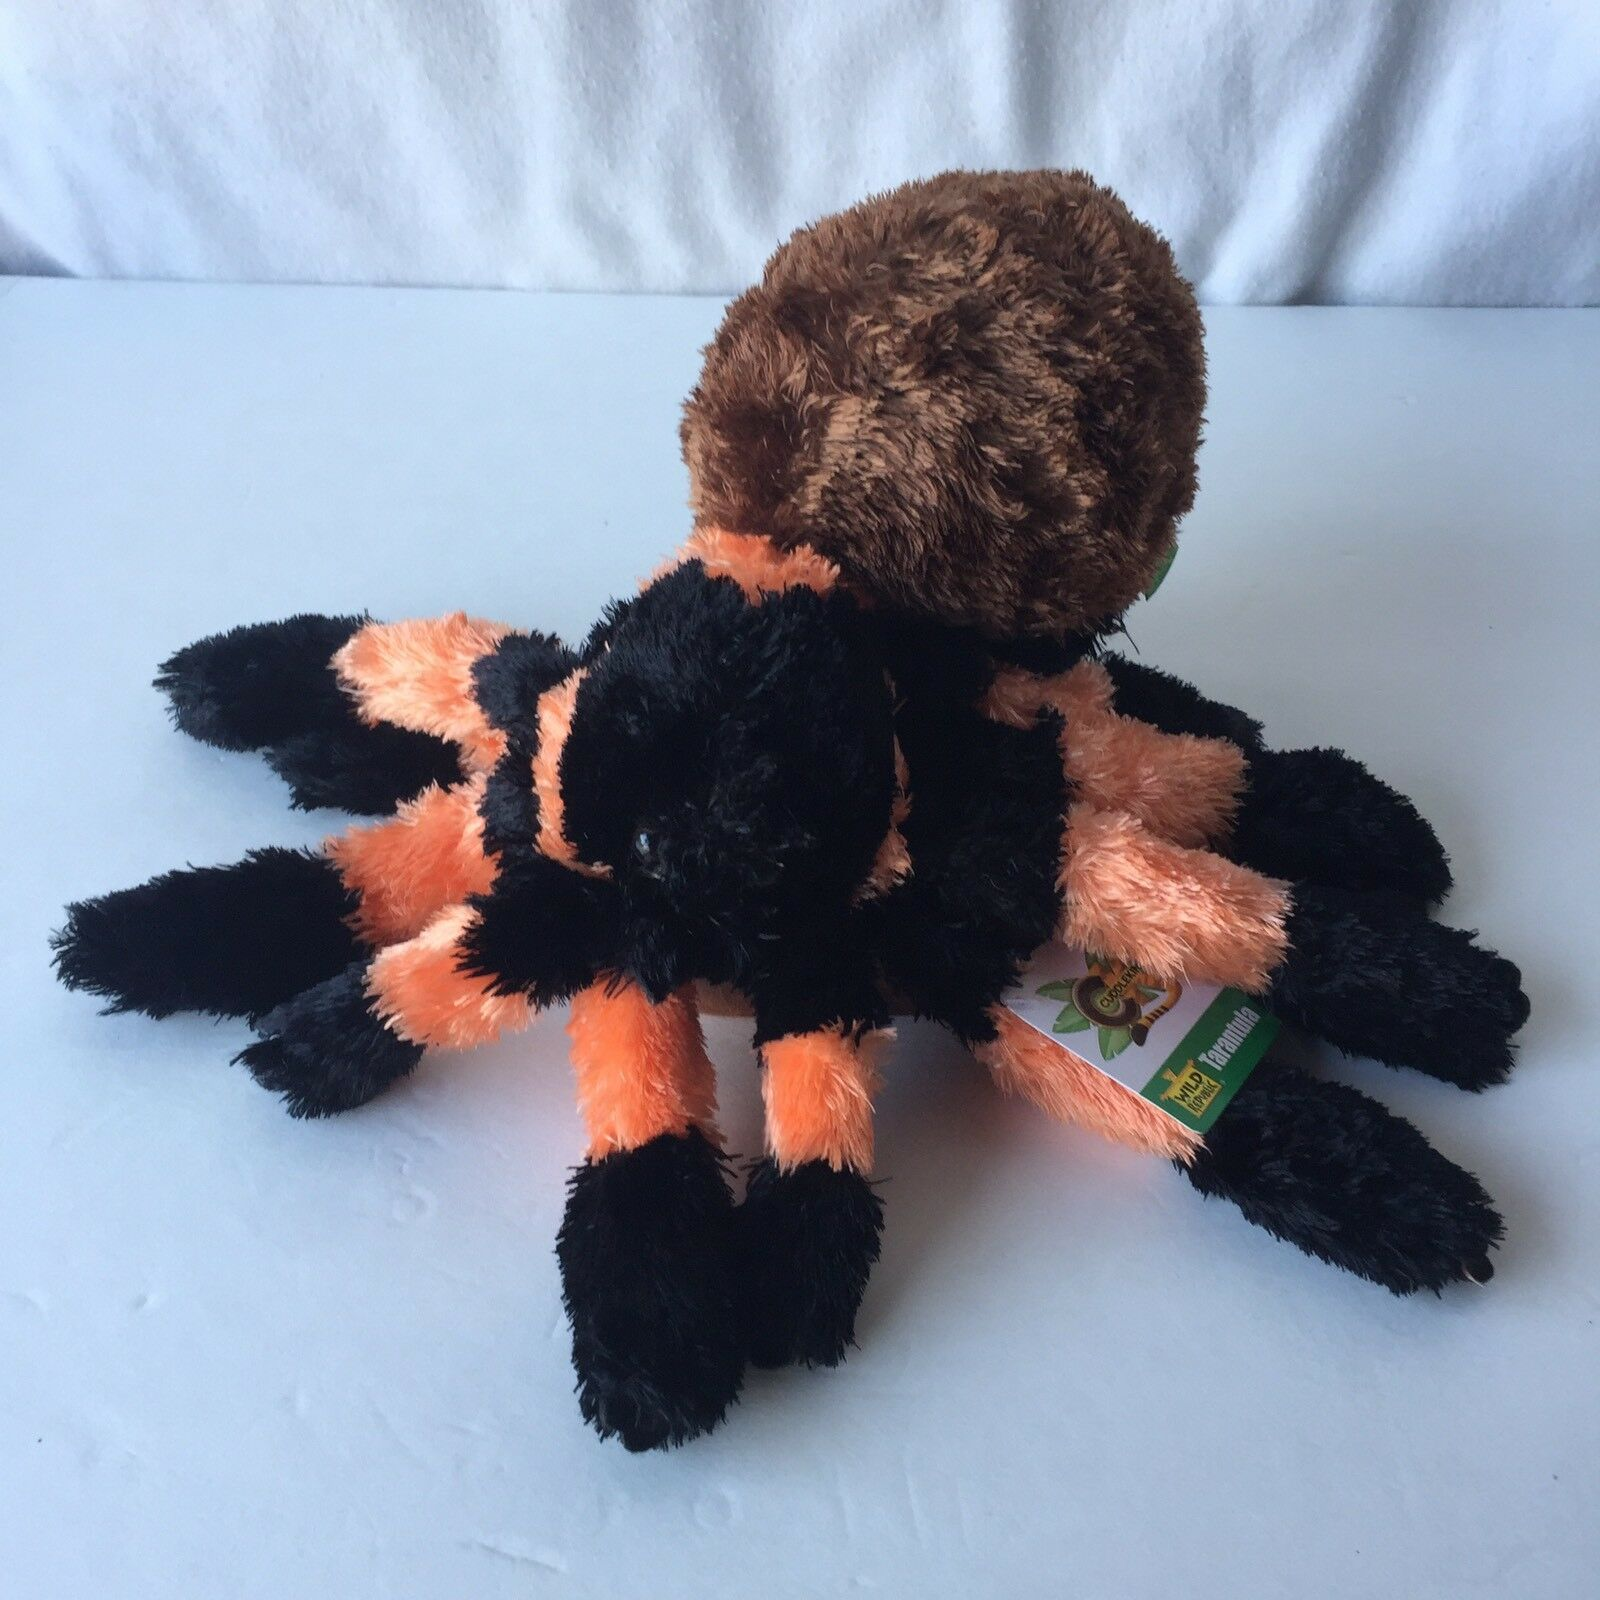 Tarantula Stuffed Animal, Wild Republic Cuddlekins 12 Inch Tarantula Hashmanis Org